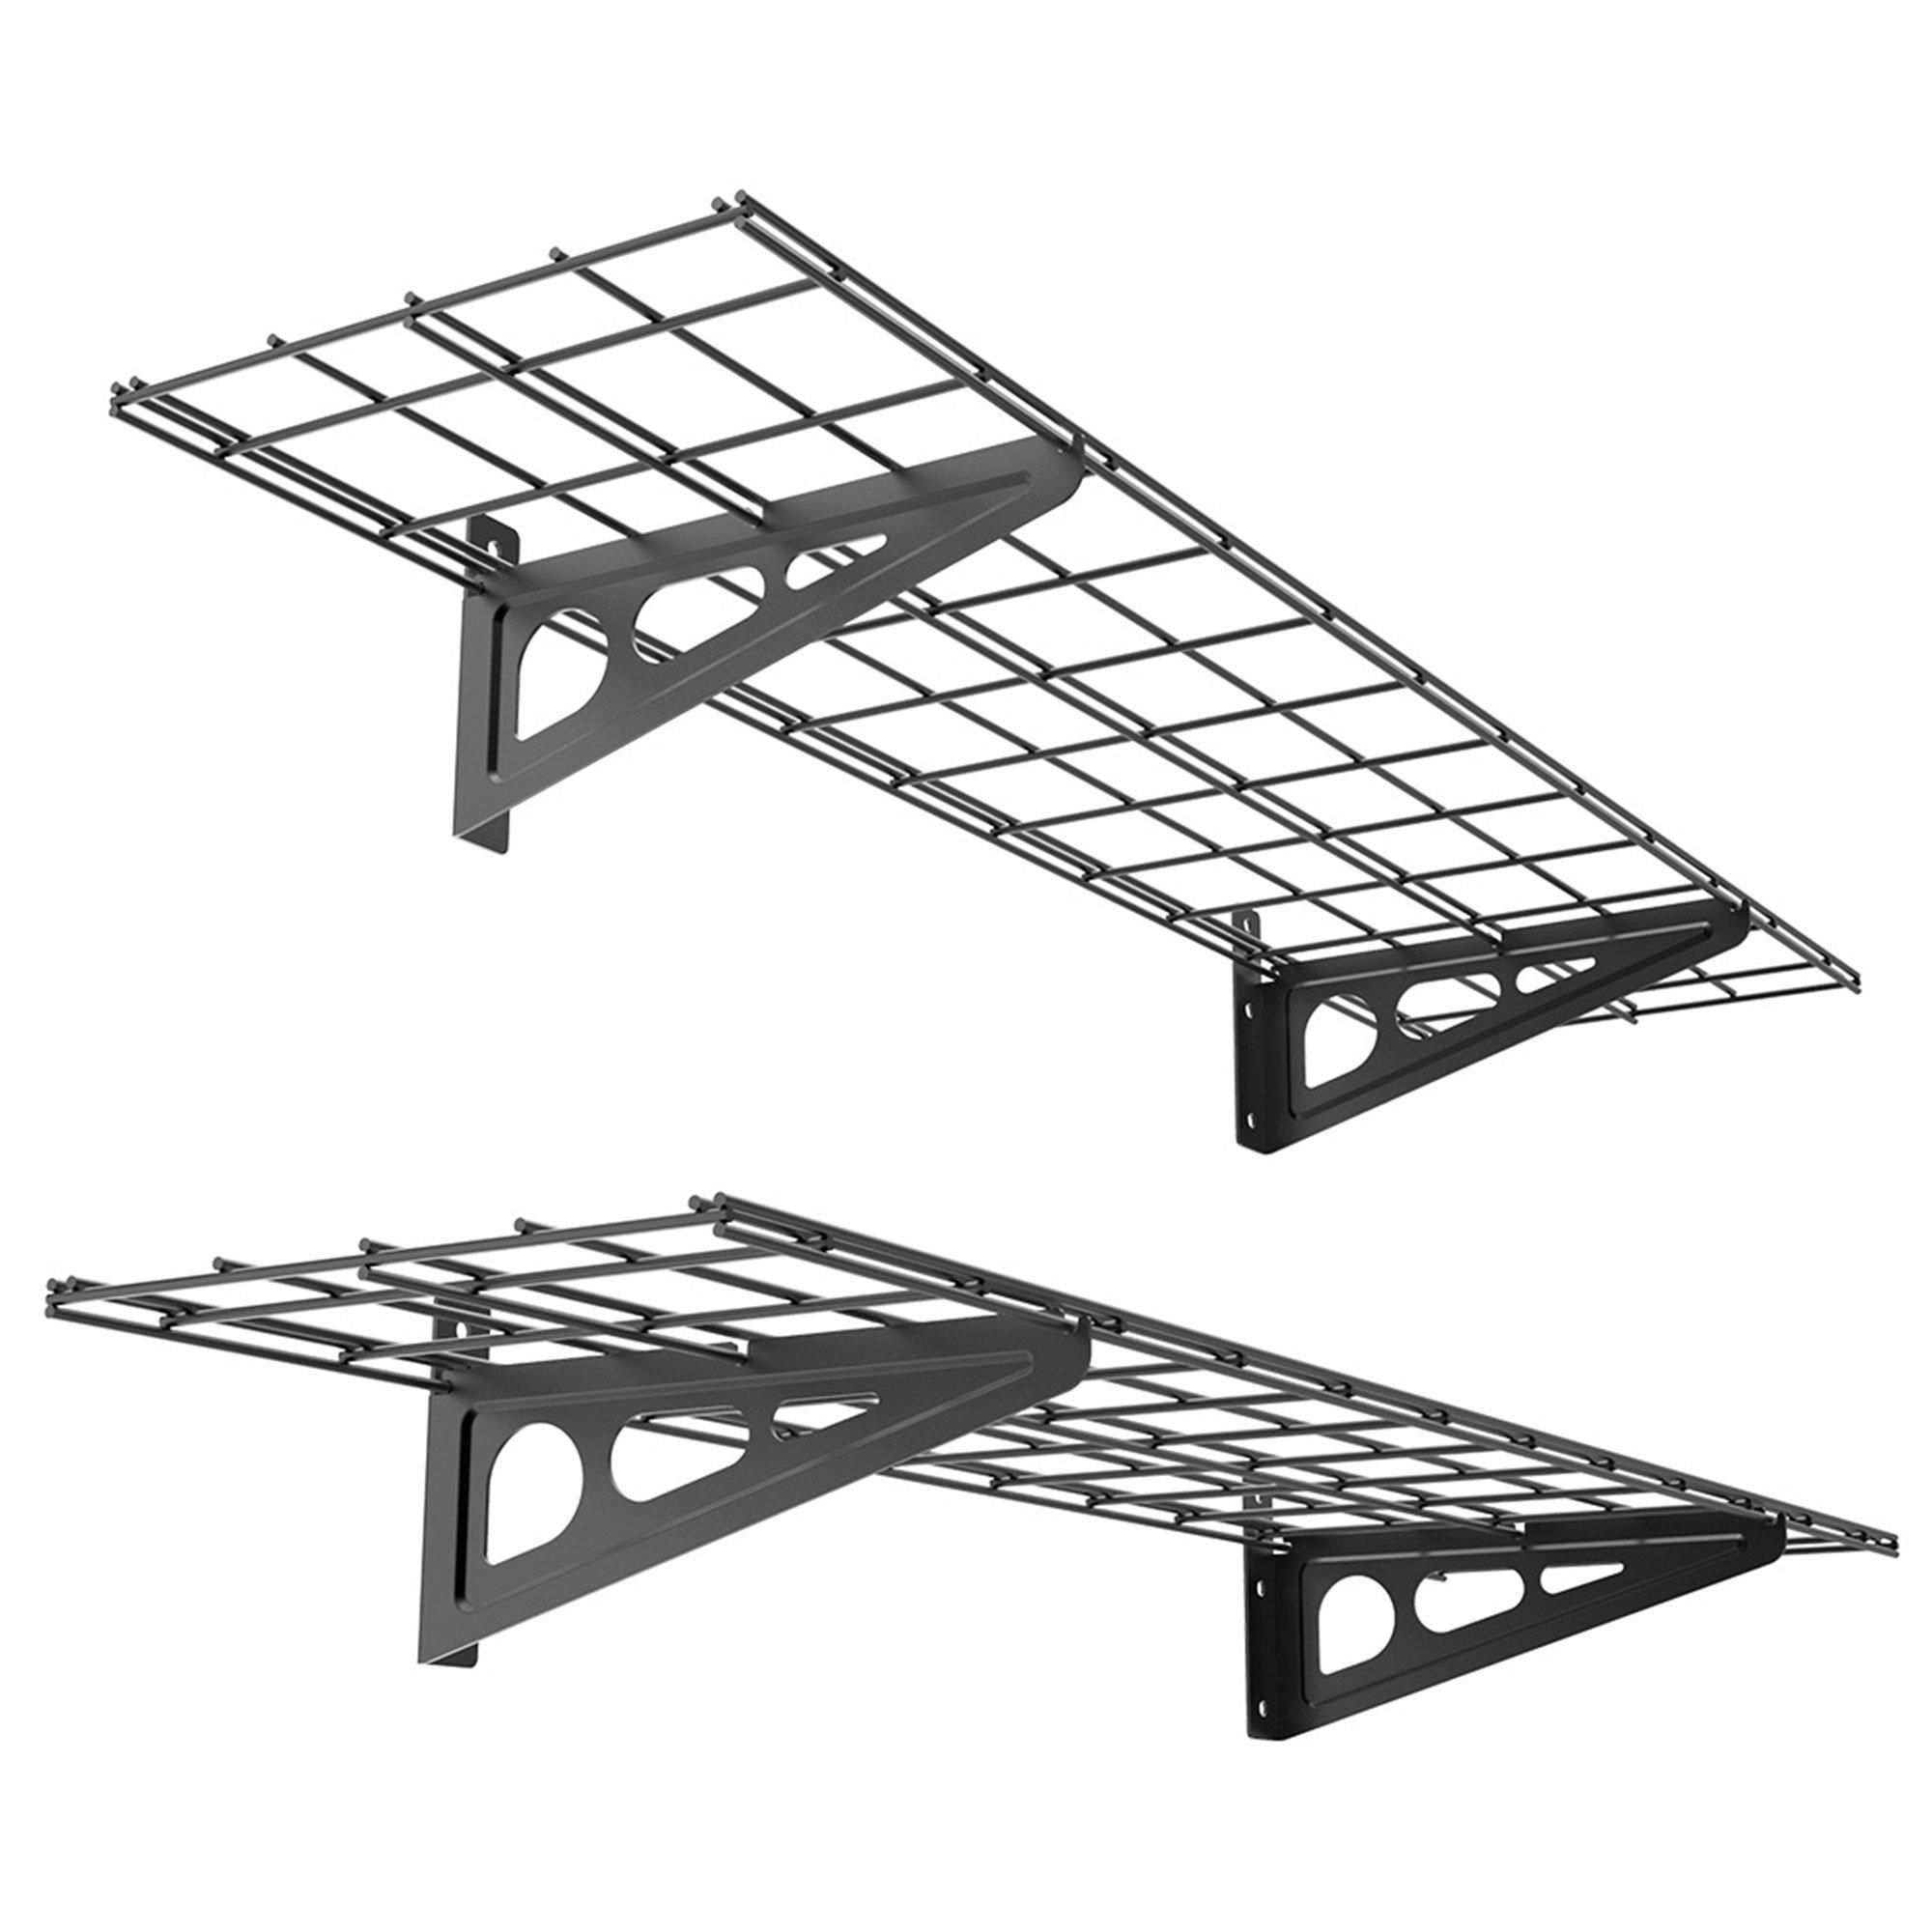 FLEXIMOUNTS WR14B-SBA 1' x 4' Wall Shelf Garage Storage Rack (2 Pack), Black, 12'' x 48''